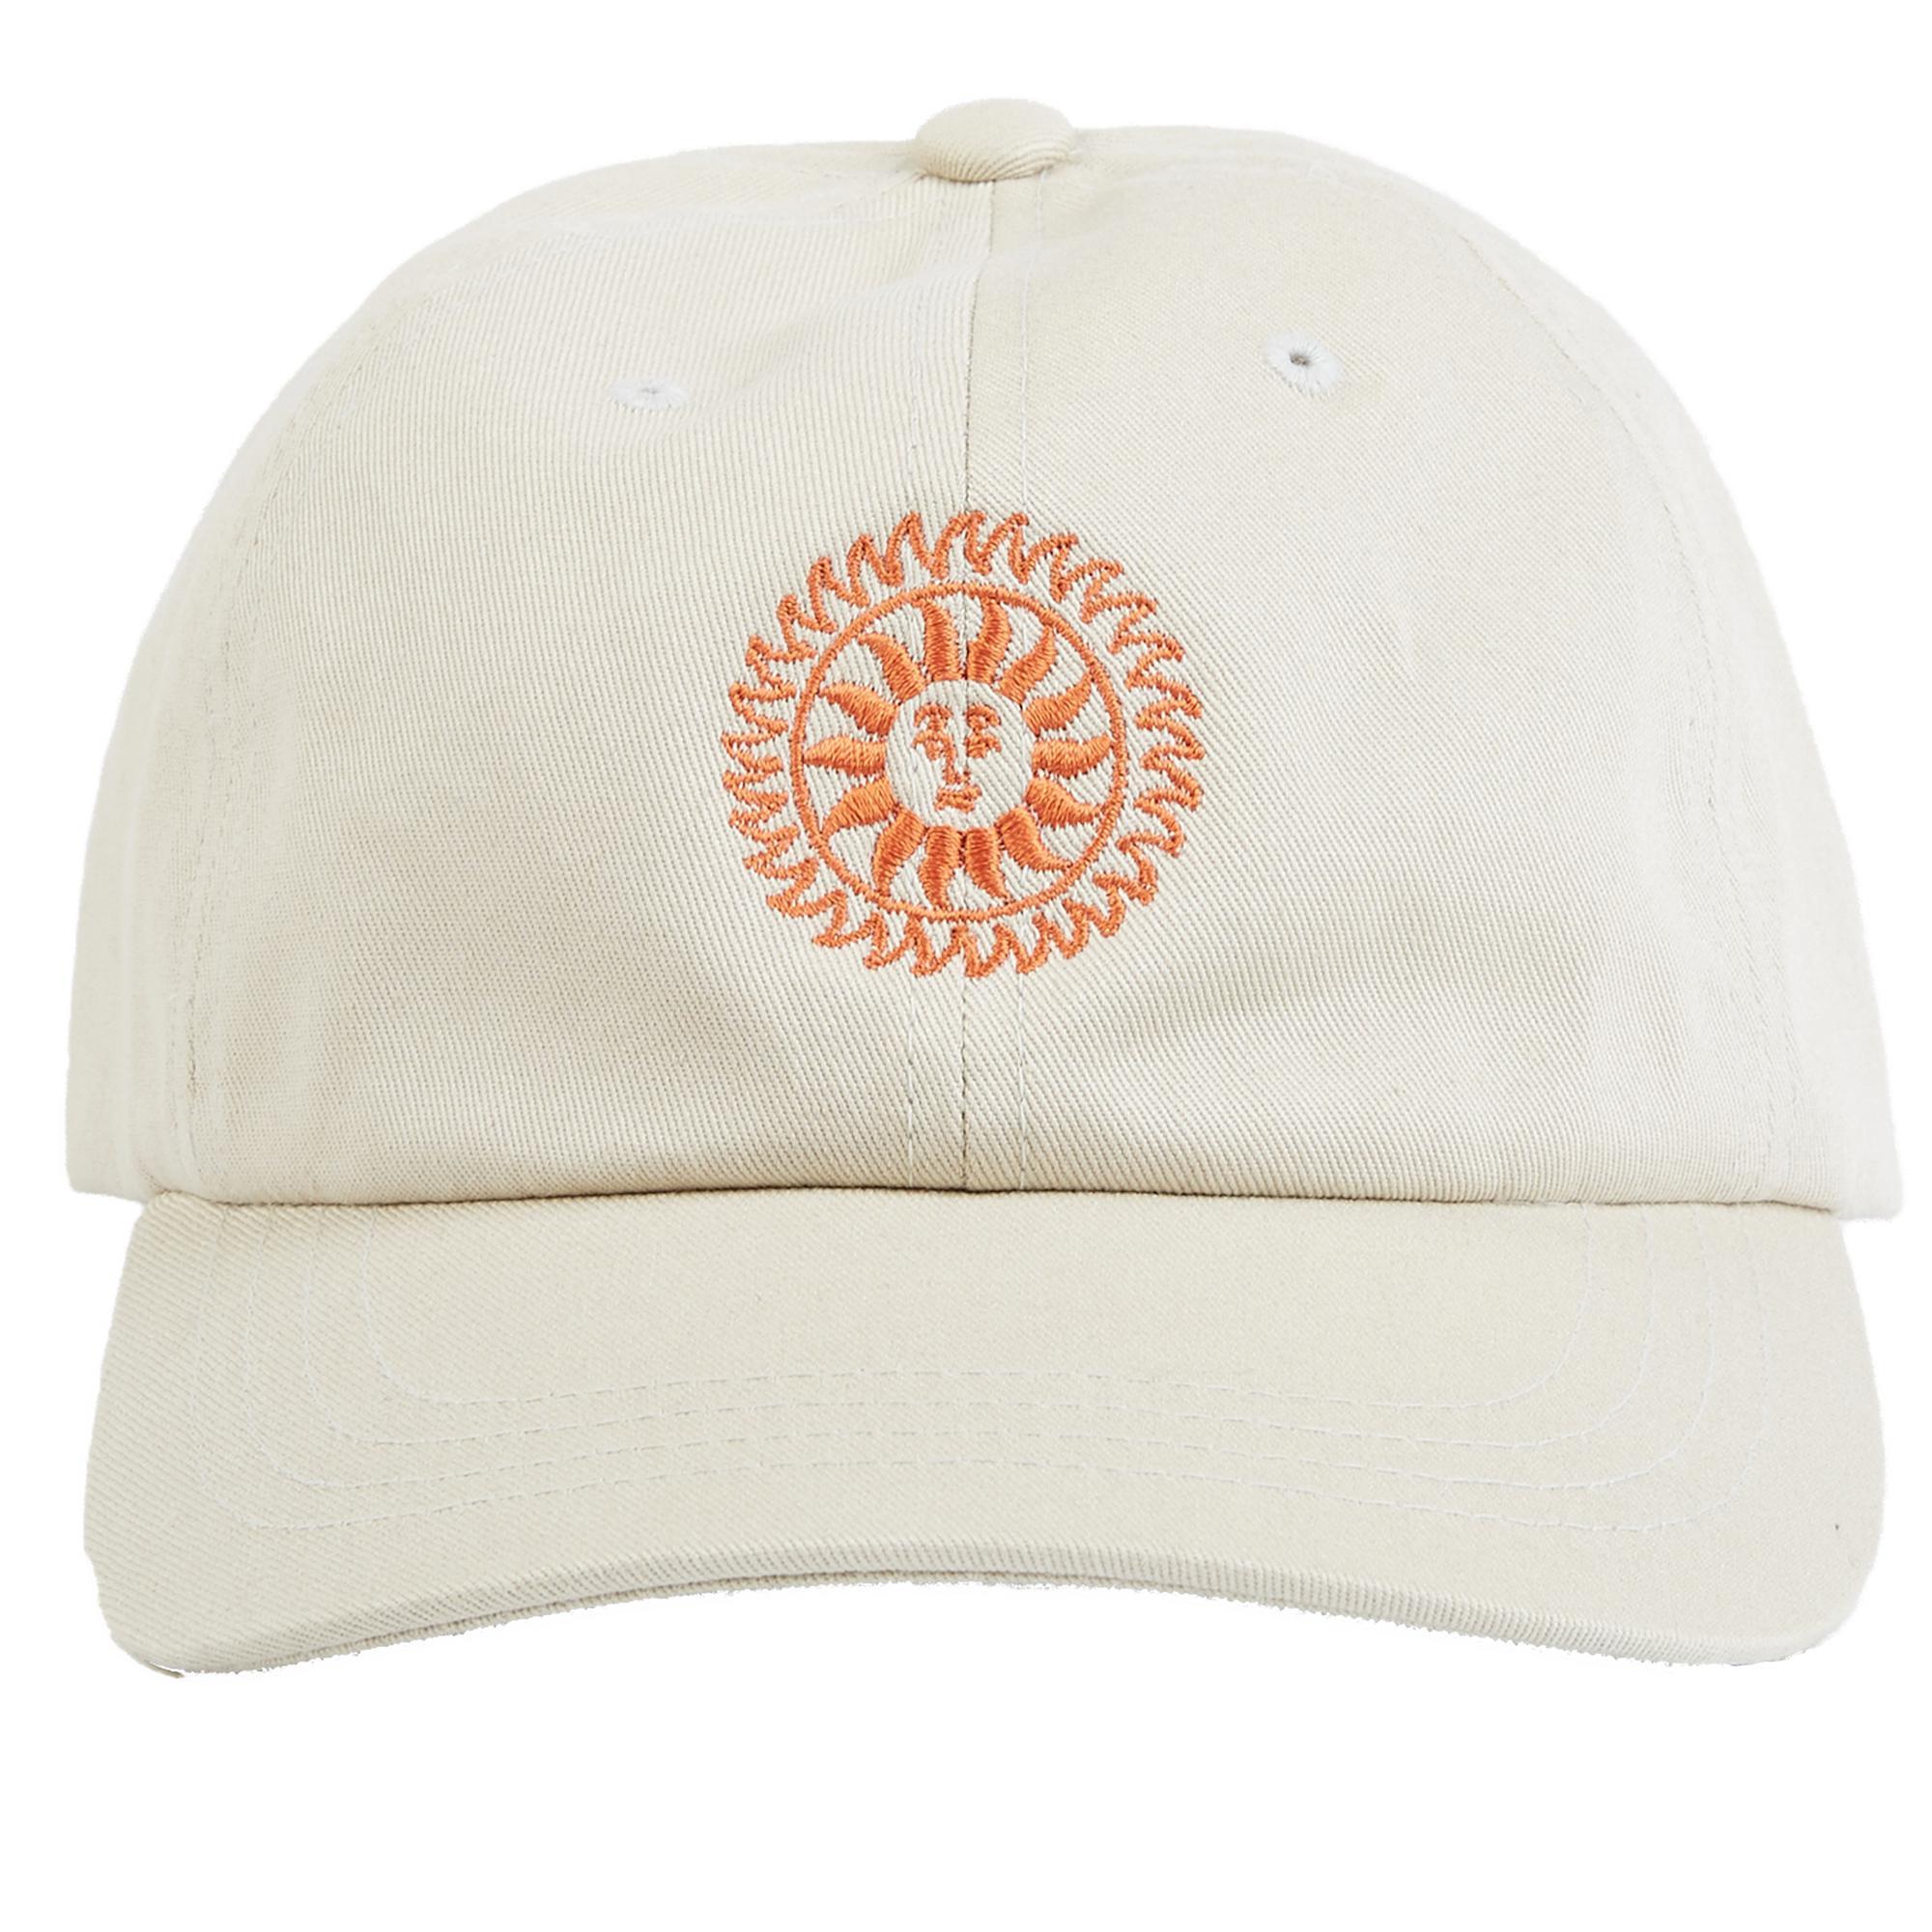 Lyst - Billabong Señor Sol Lad Cap in White for Men bd81cab09cc3